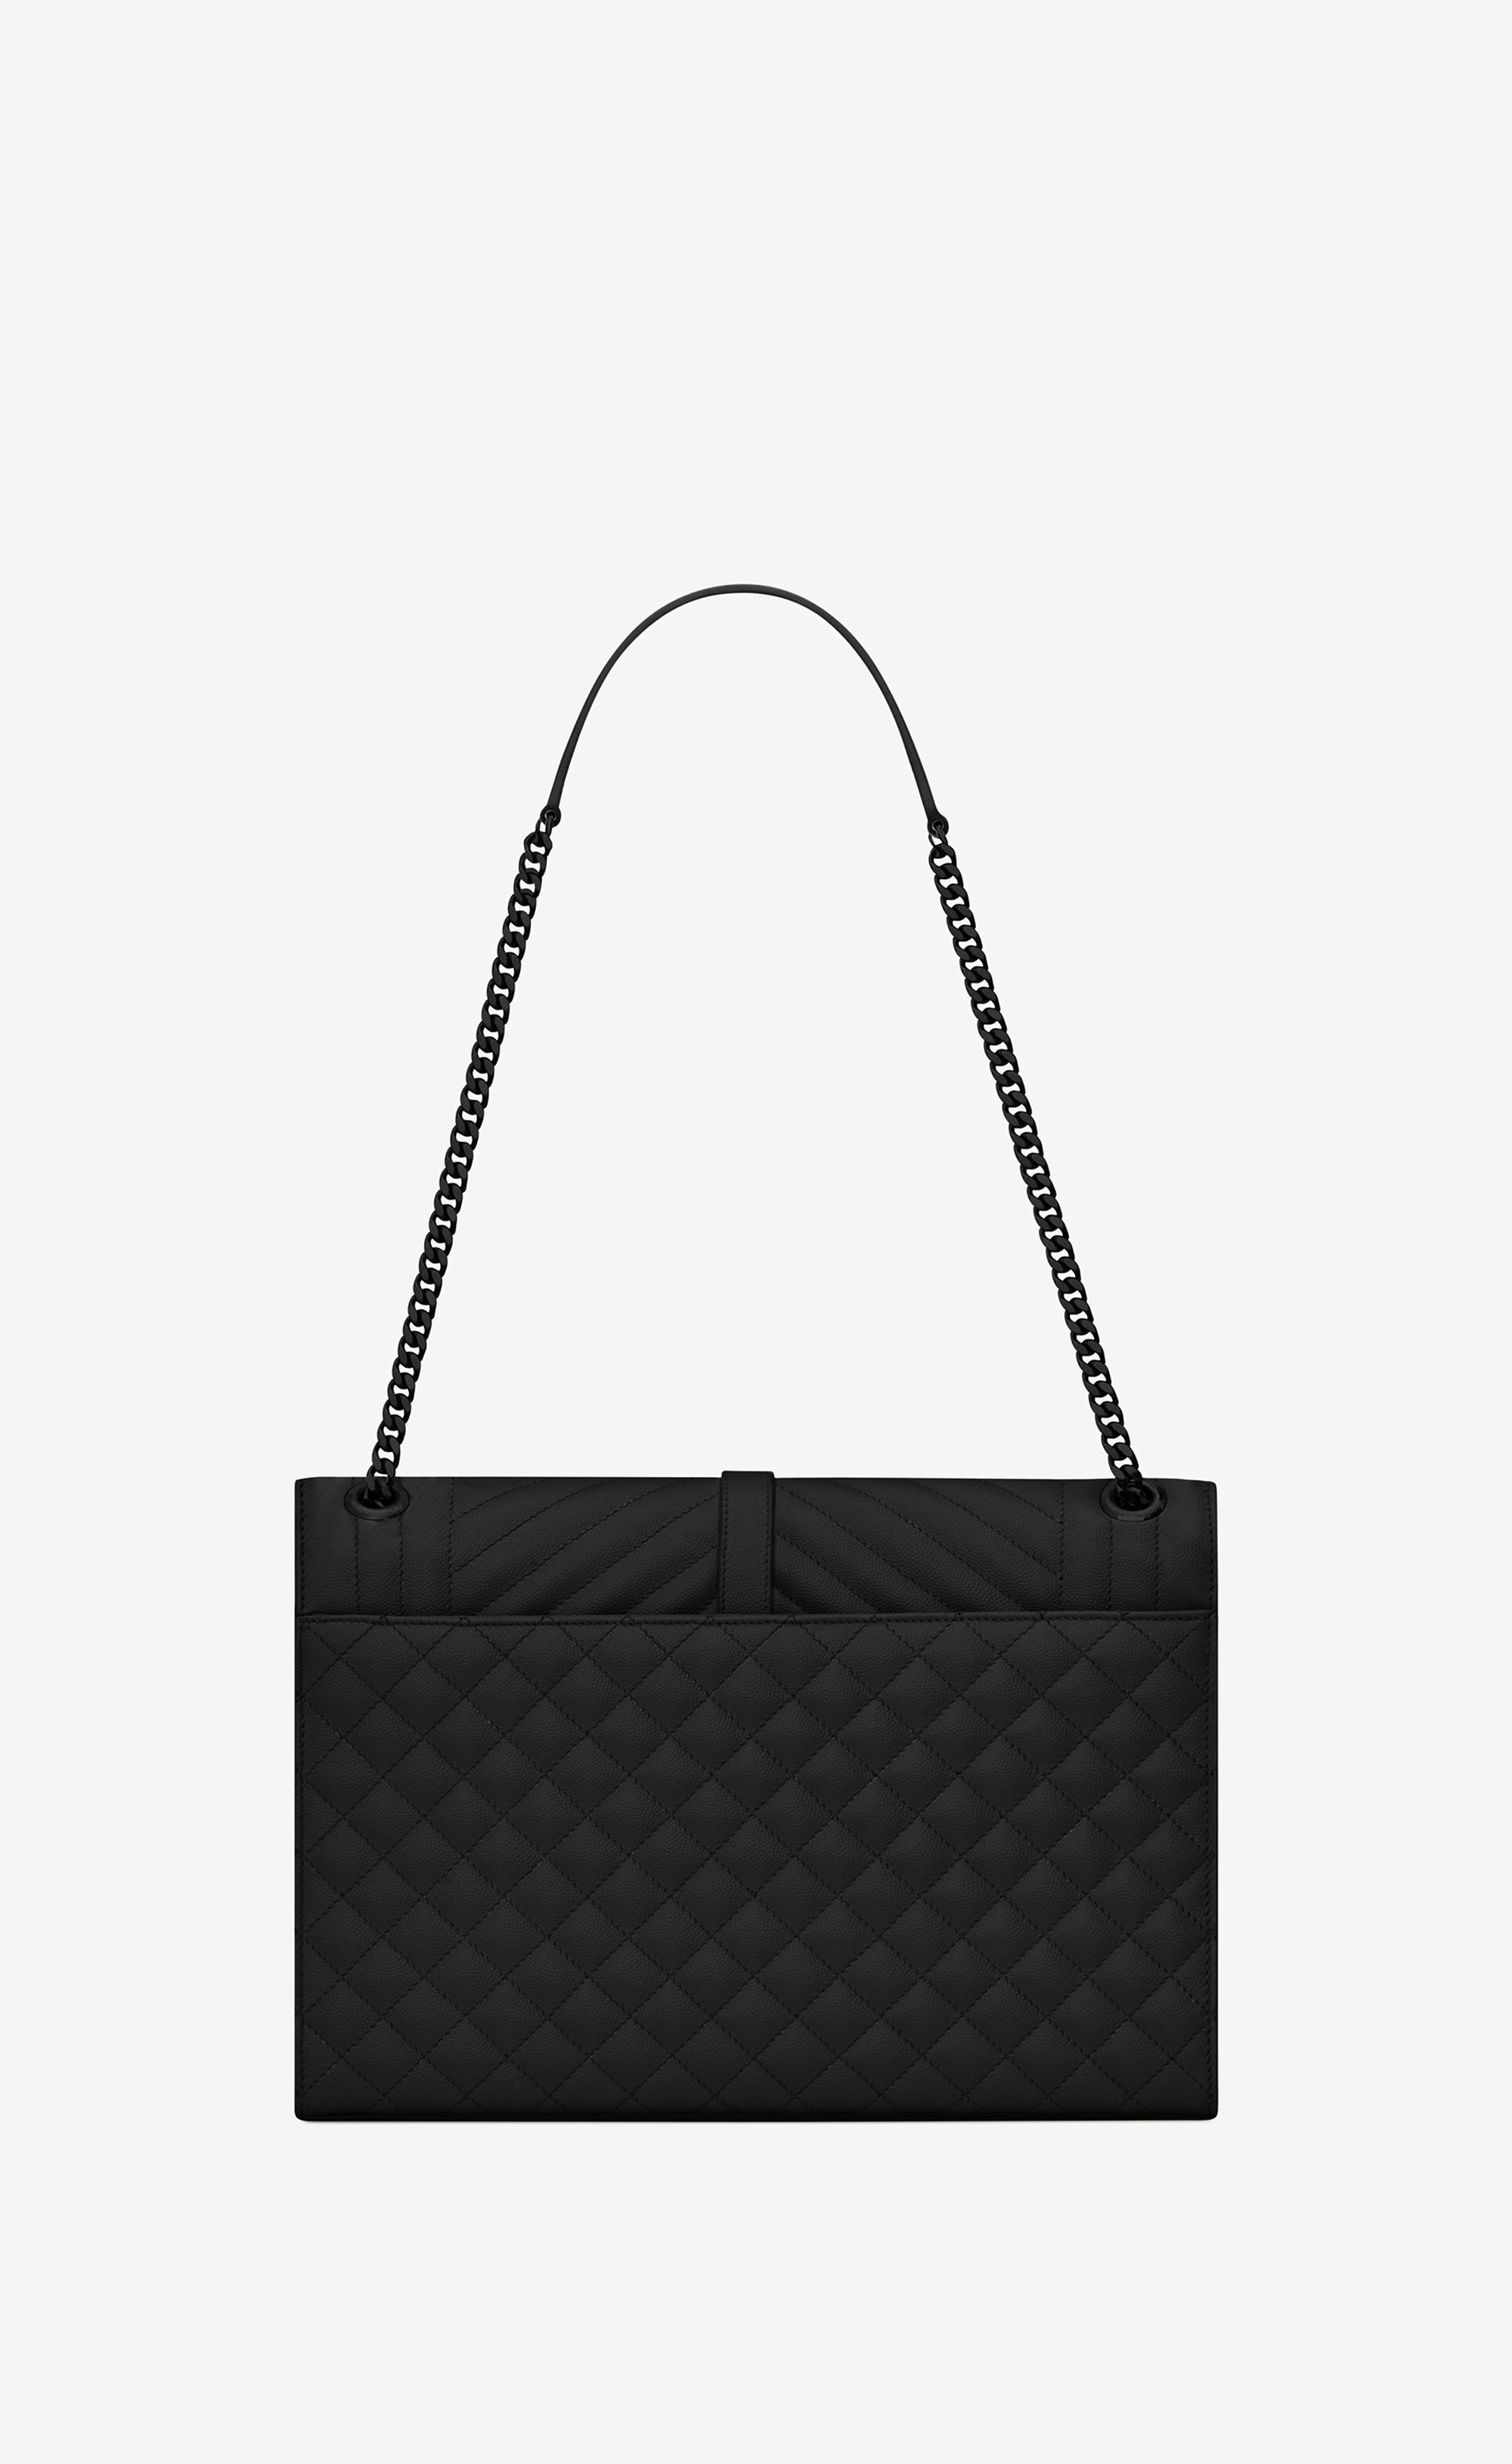 9312ed0836 Saint Laurent - Black Envelope Large Bag - Lyst. View fullscreen